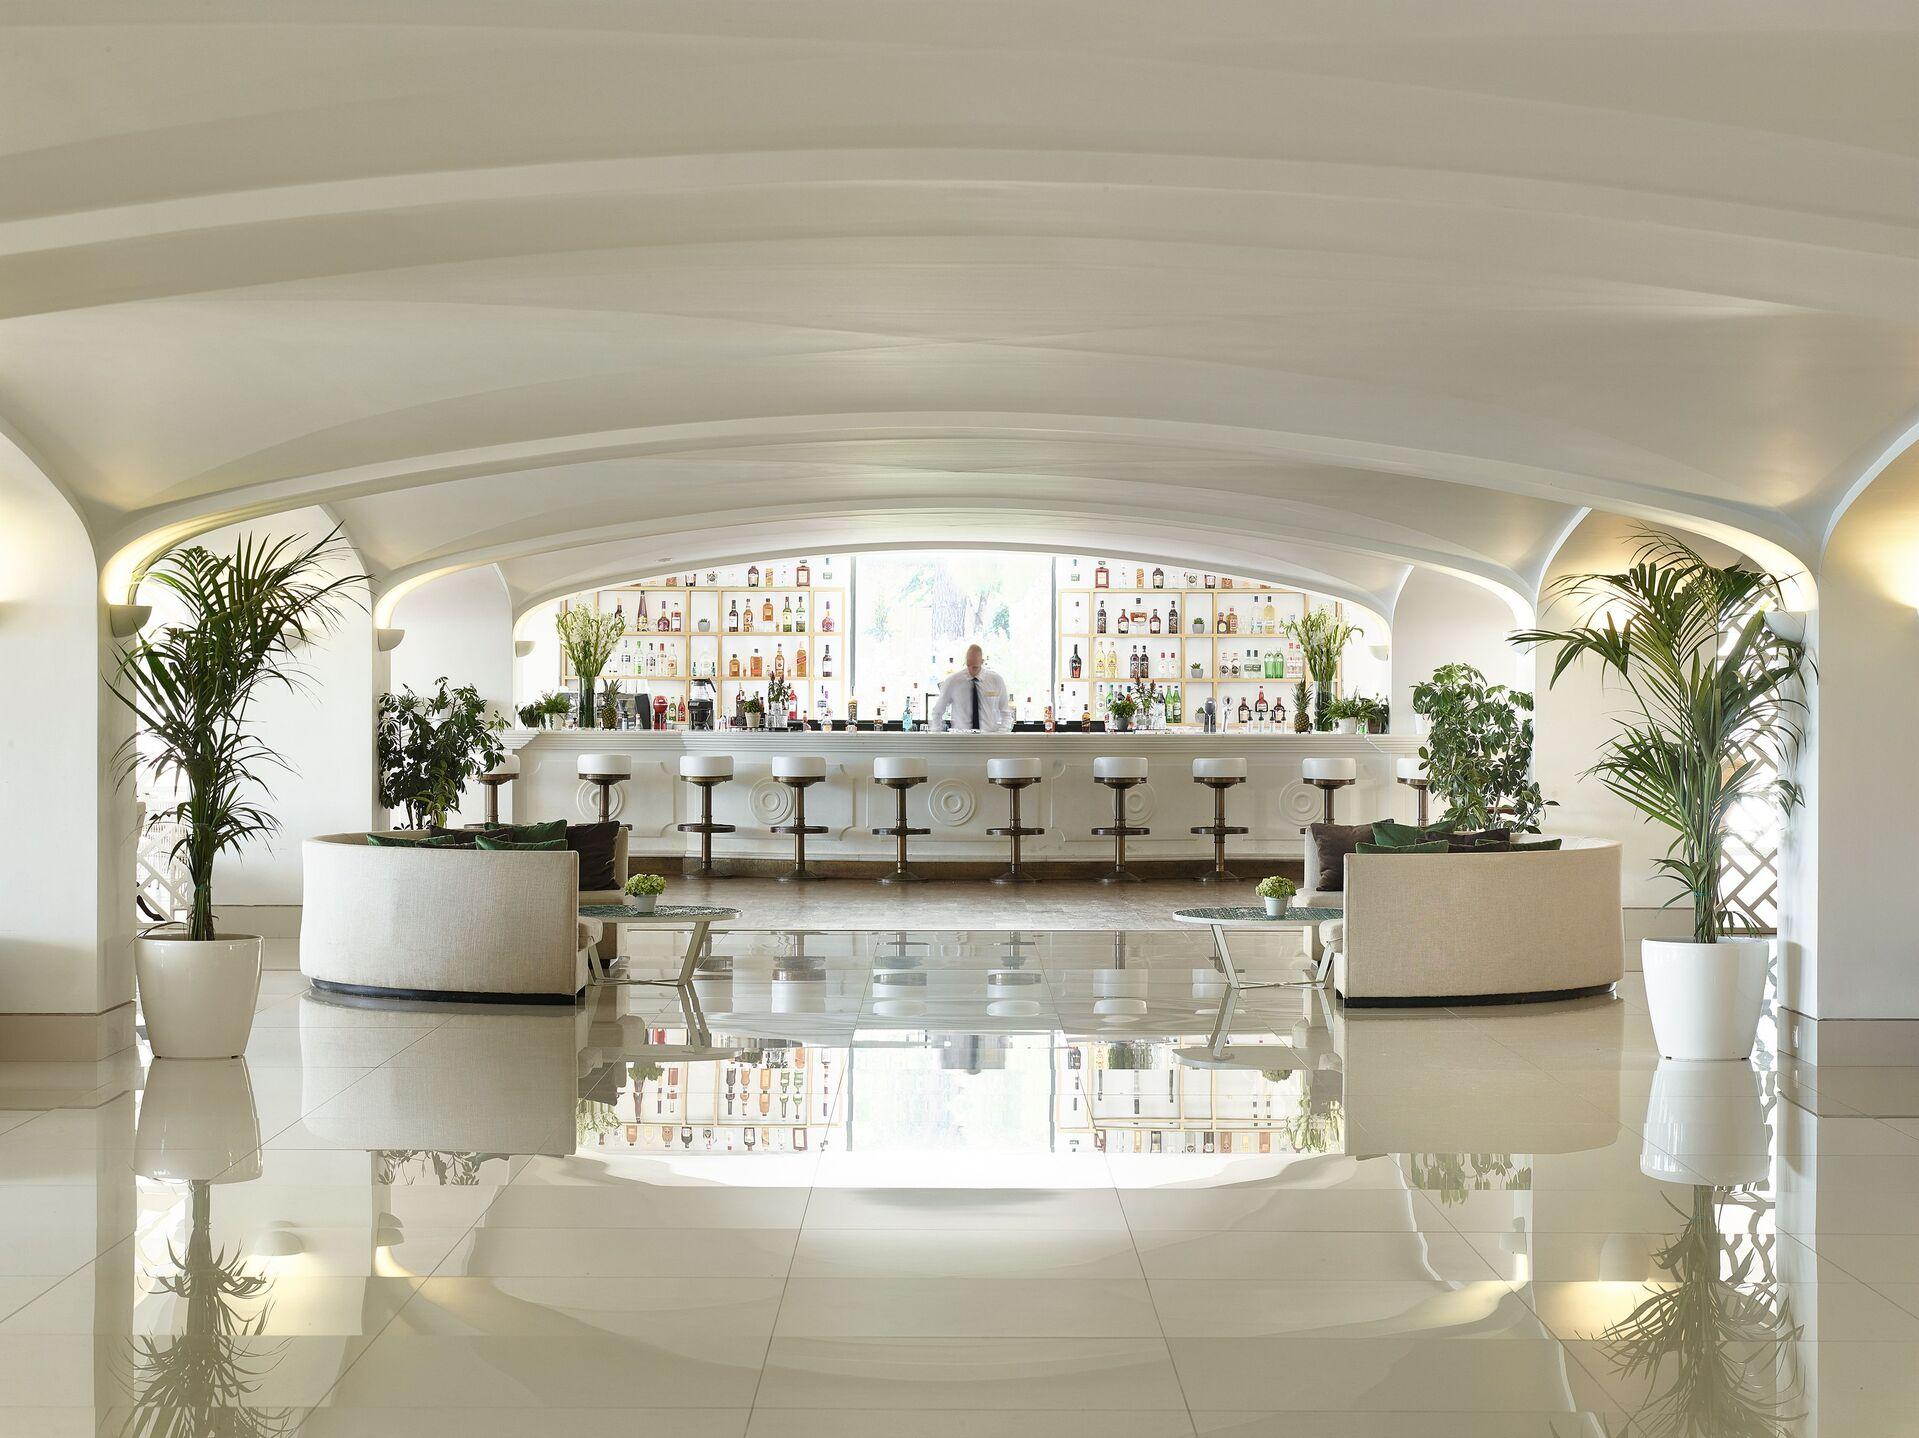 https://cms.satur.sk/data/imgs/tour_image/orig/15-kiparrisi-terrasse-bar-and-salon_72dpi-1924854.jpg